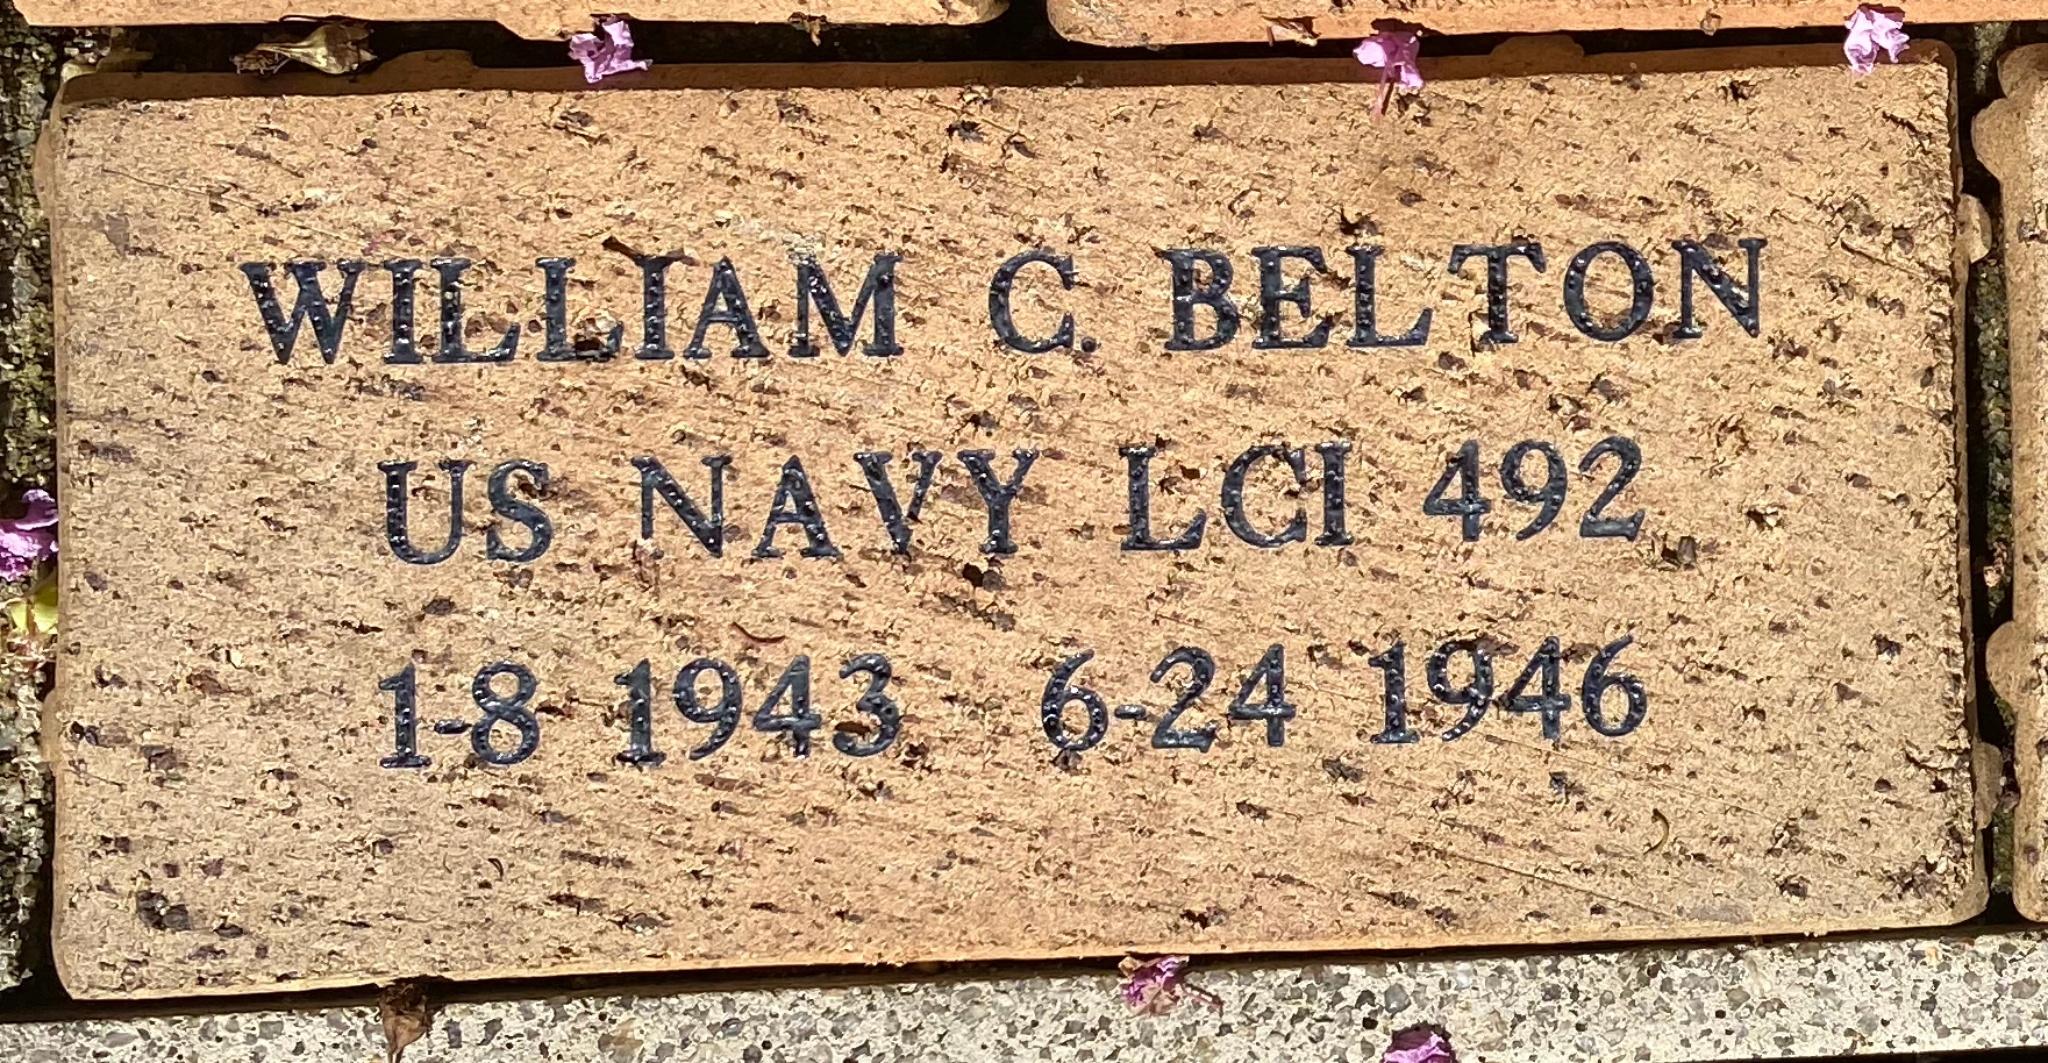 WILLIAM C BELTON US NAVY LCI 492 1-8 1943 6-24 1946